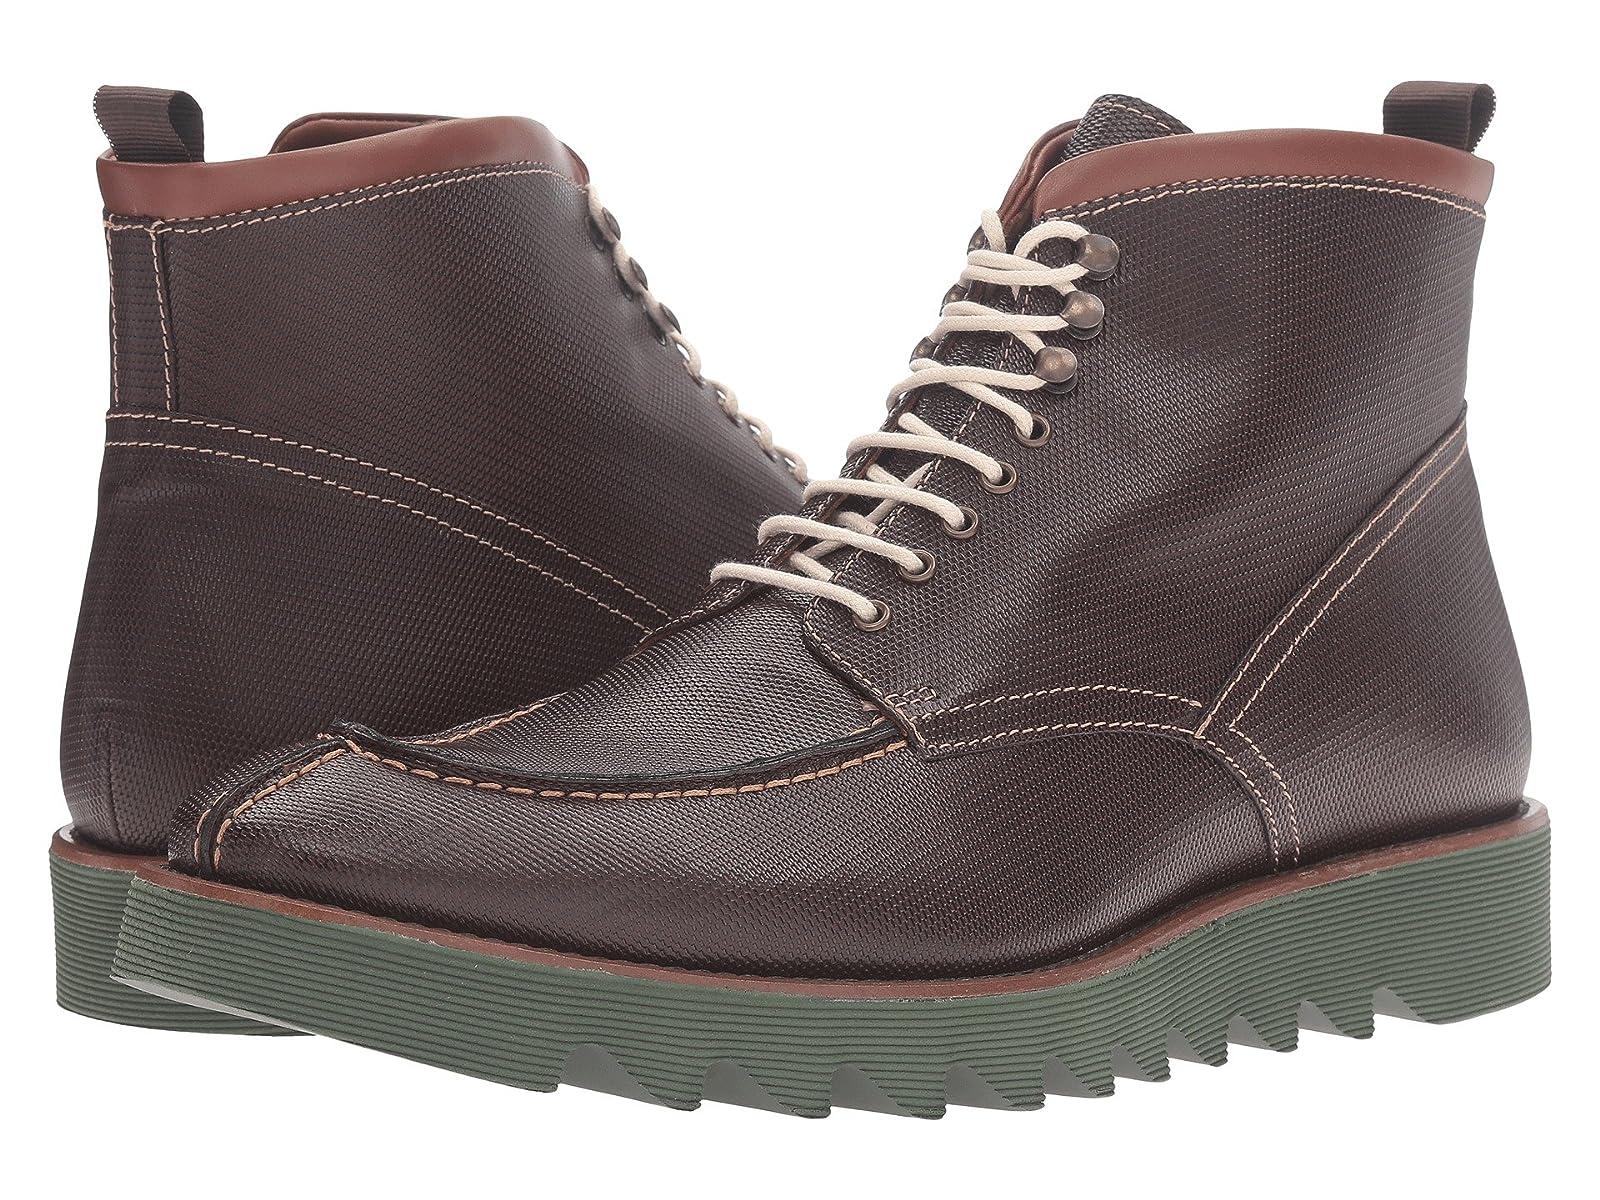 Donald J Pliner SansoneCheap and distinctive eye-catching shoes